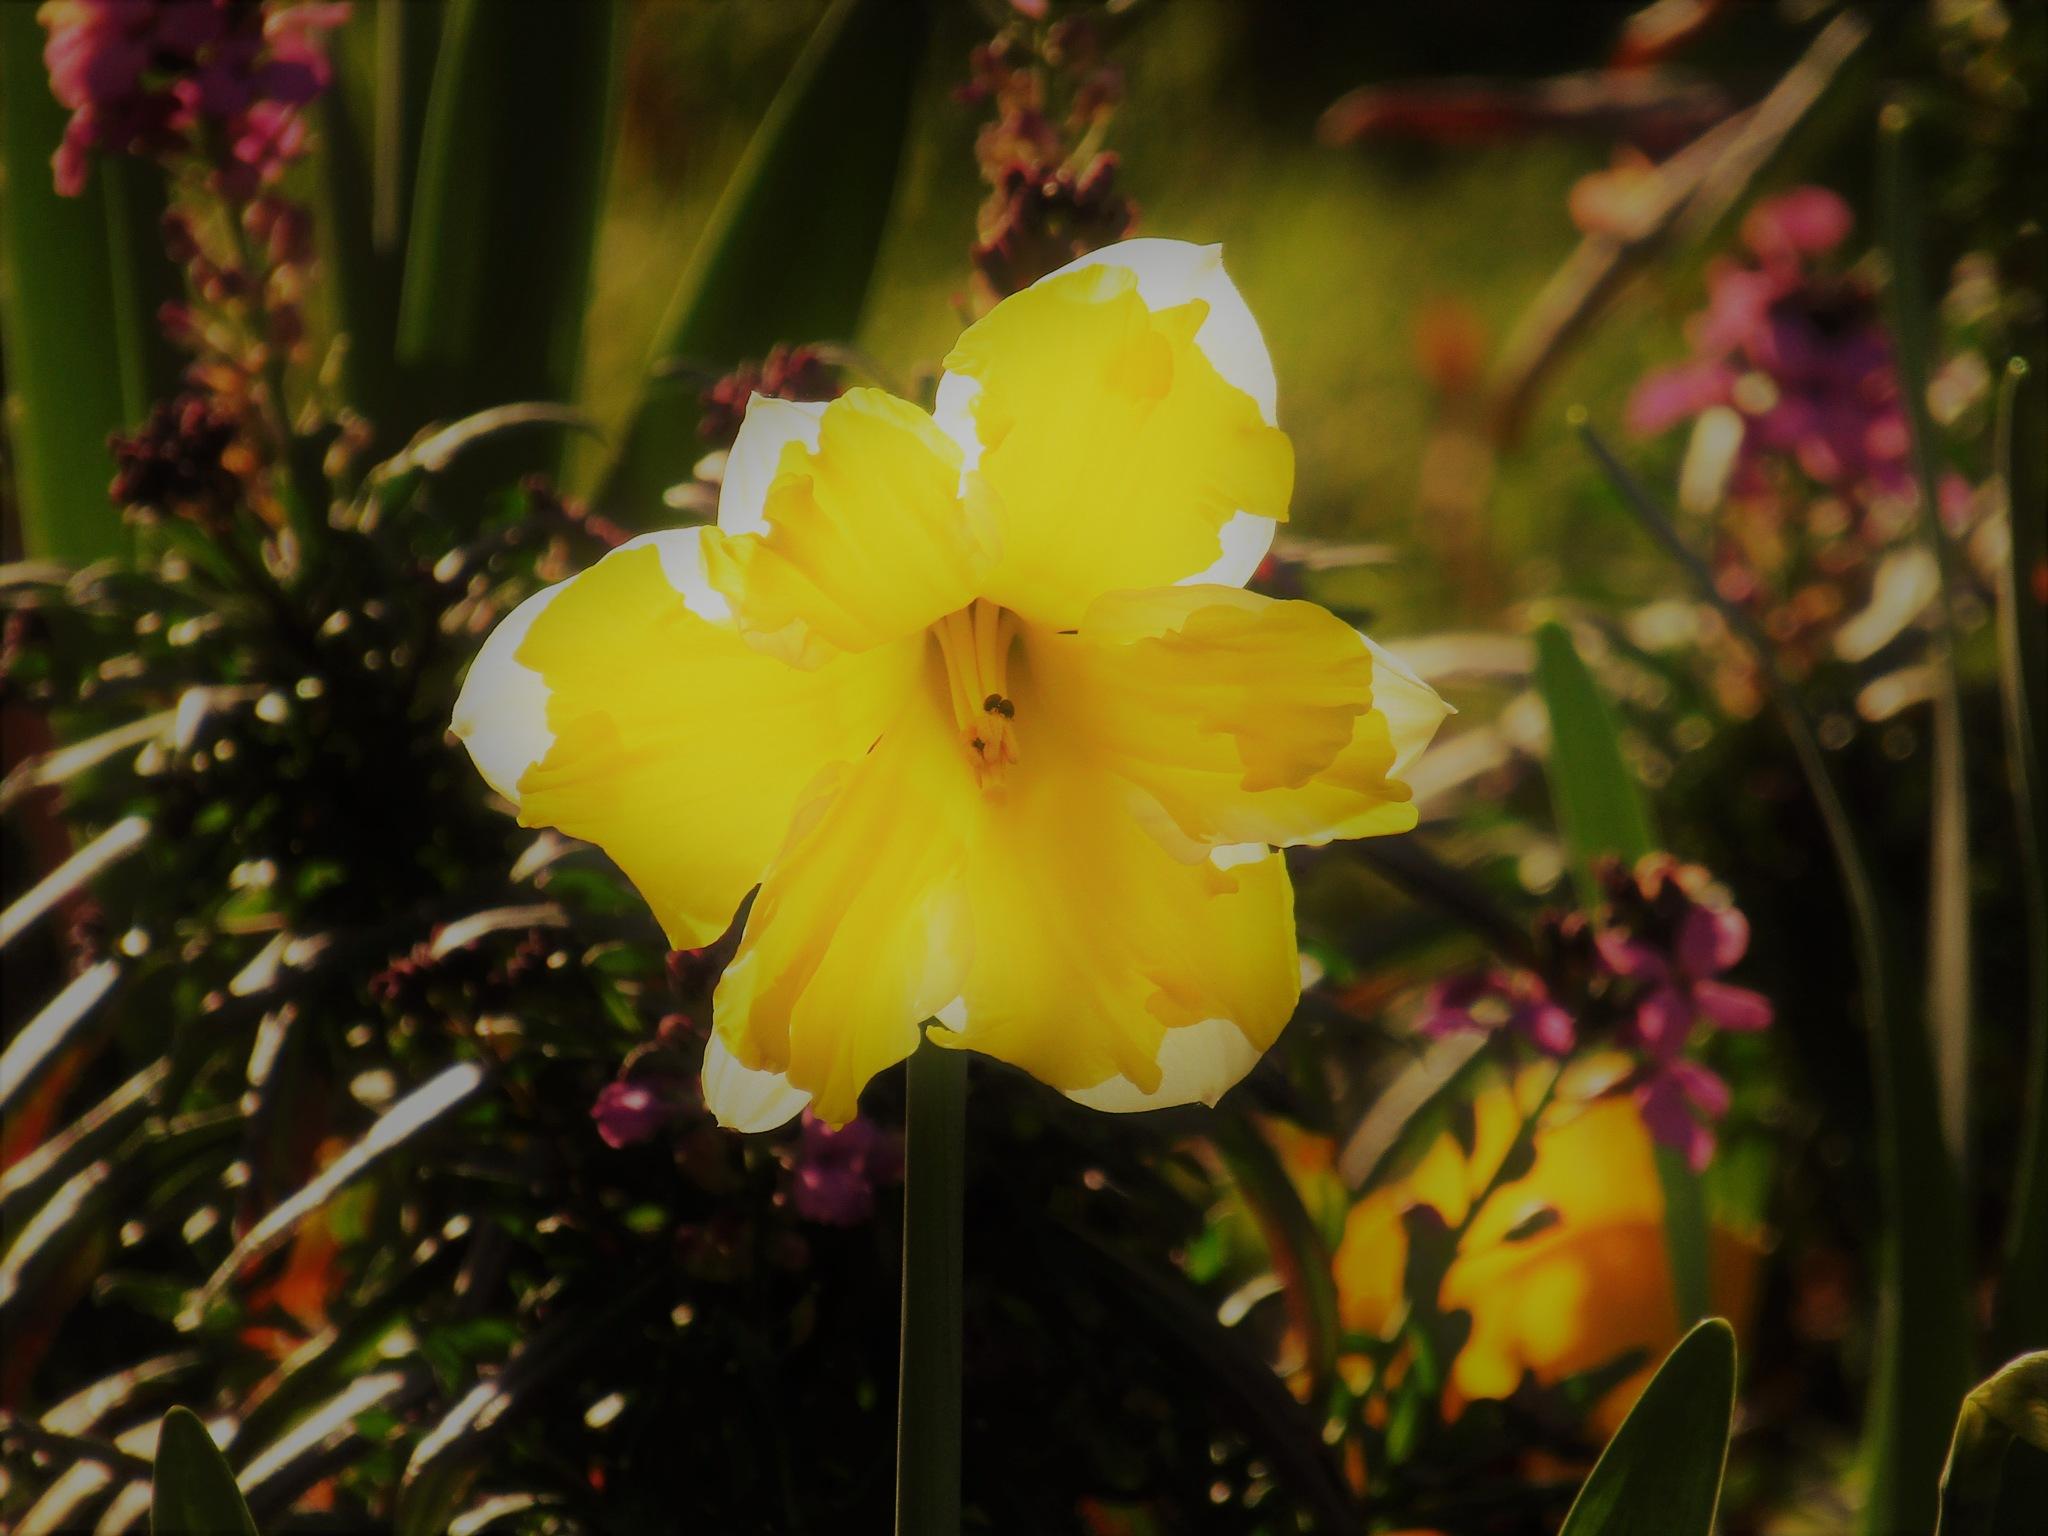 jonquille by vigilicatherine